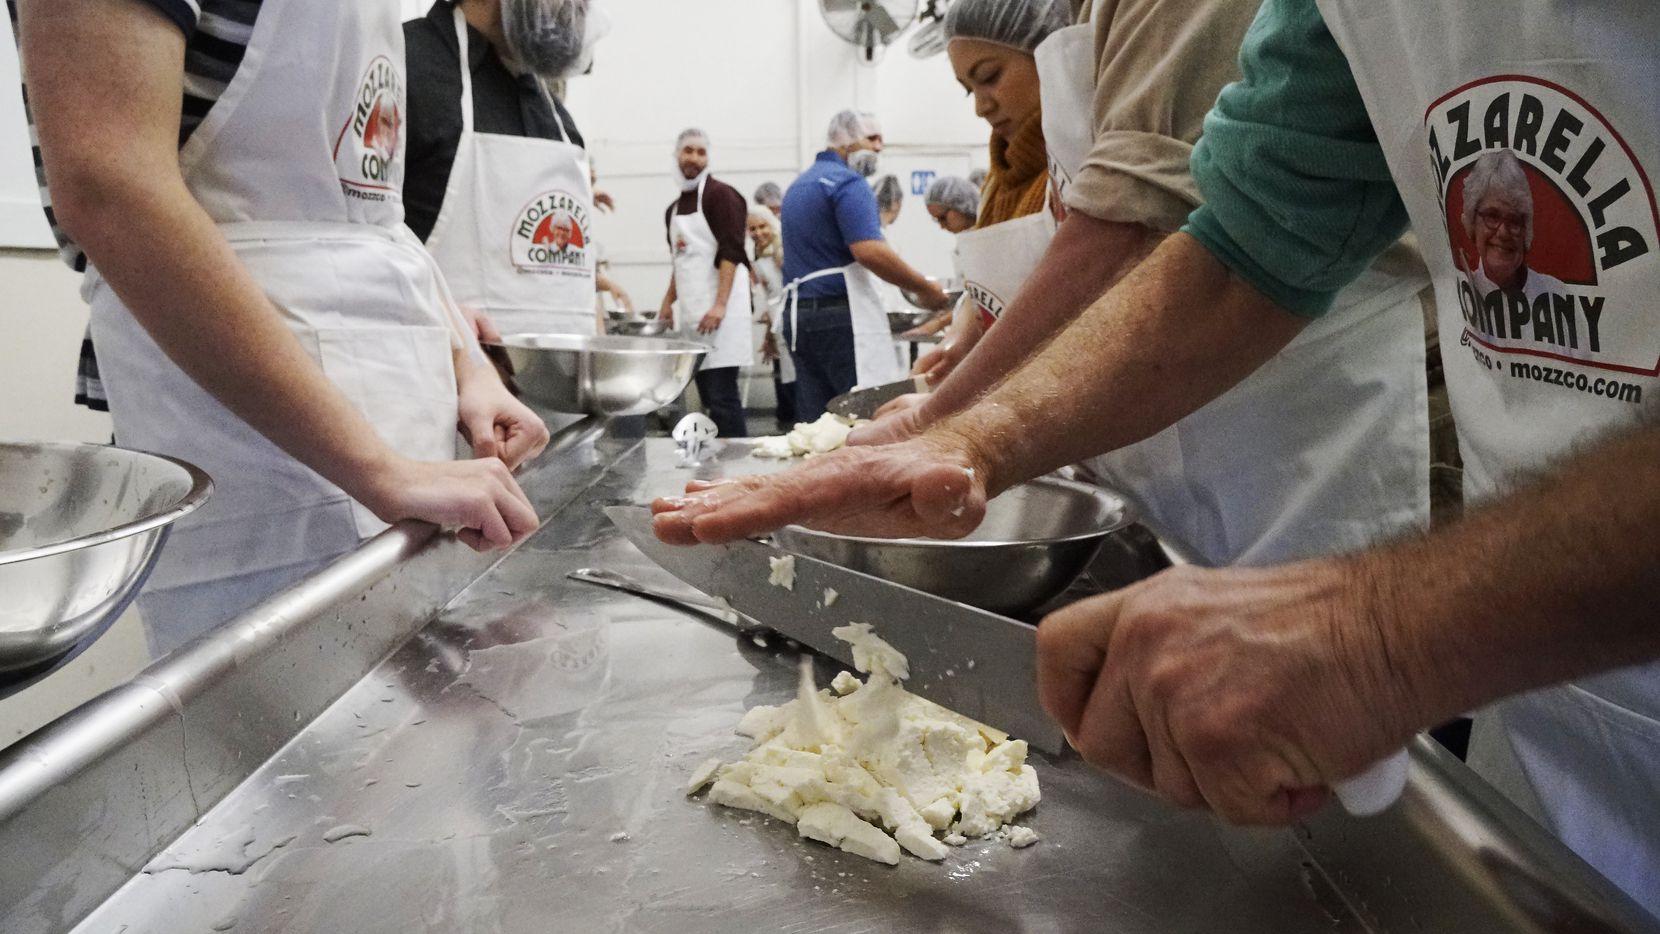 Student prepare to make cheese during a class at the Mozzarella Company.